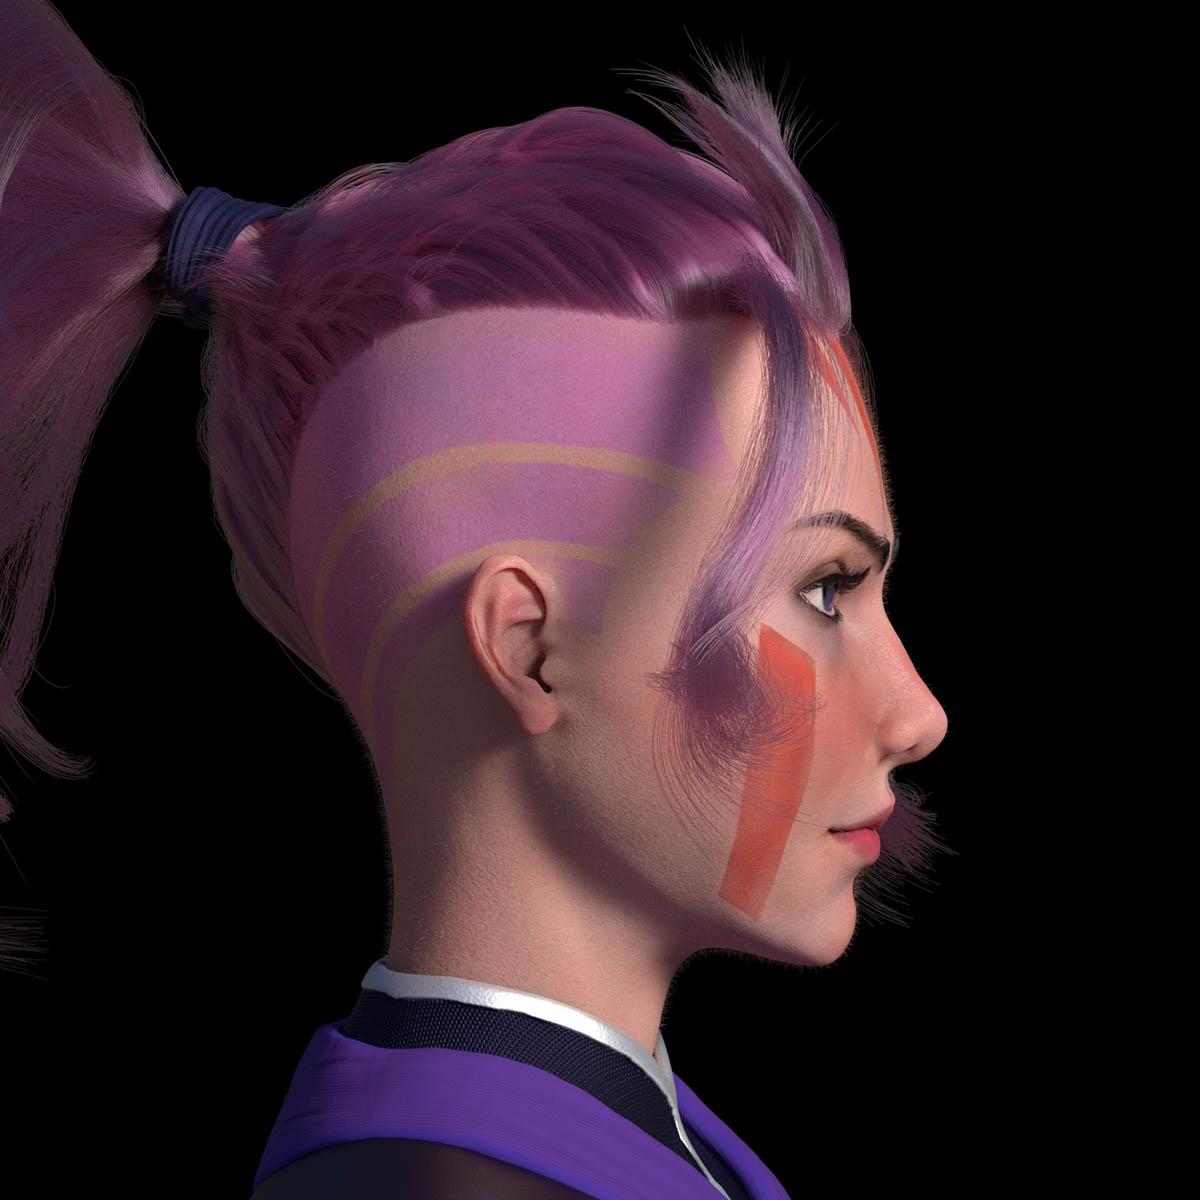 3d model purple hair woman by enkhbayarldr